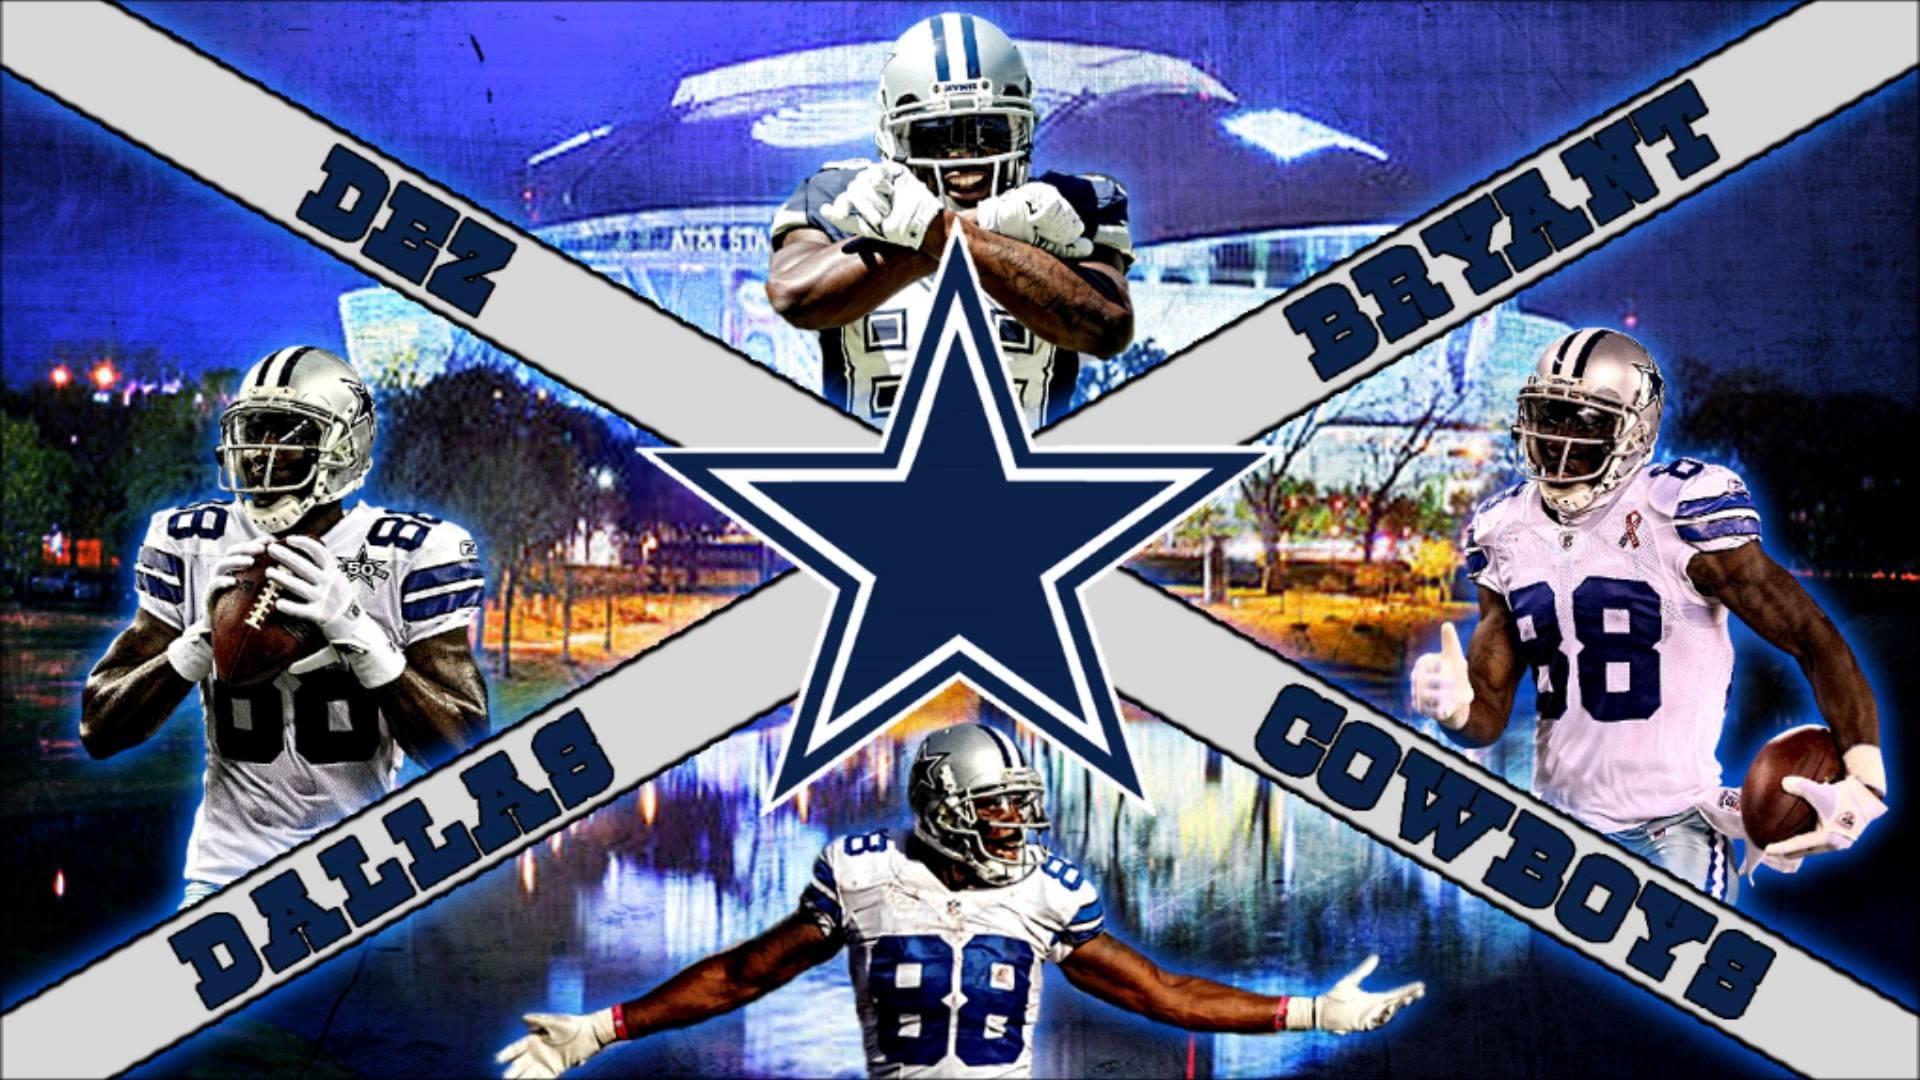 Dallas Cowboys Images Wallpapers ·① WallpaperTag